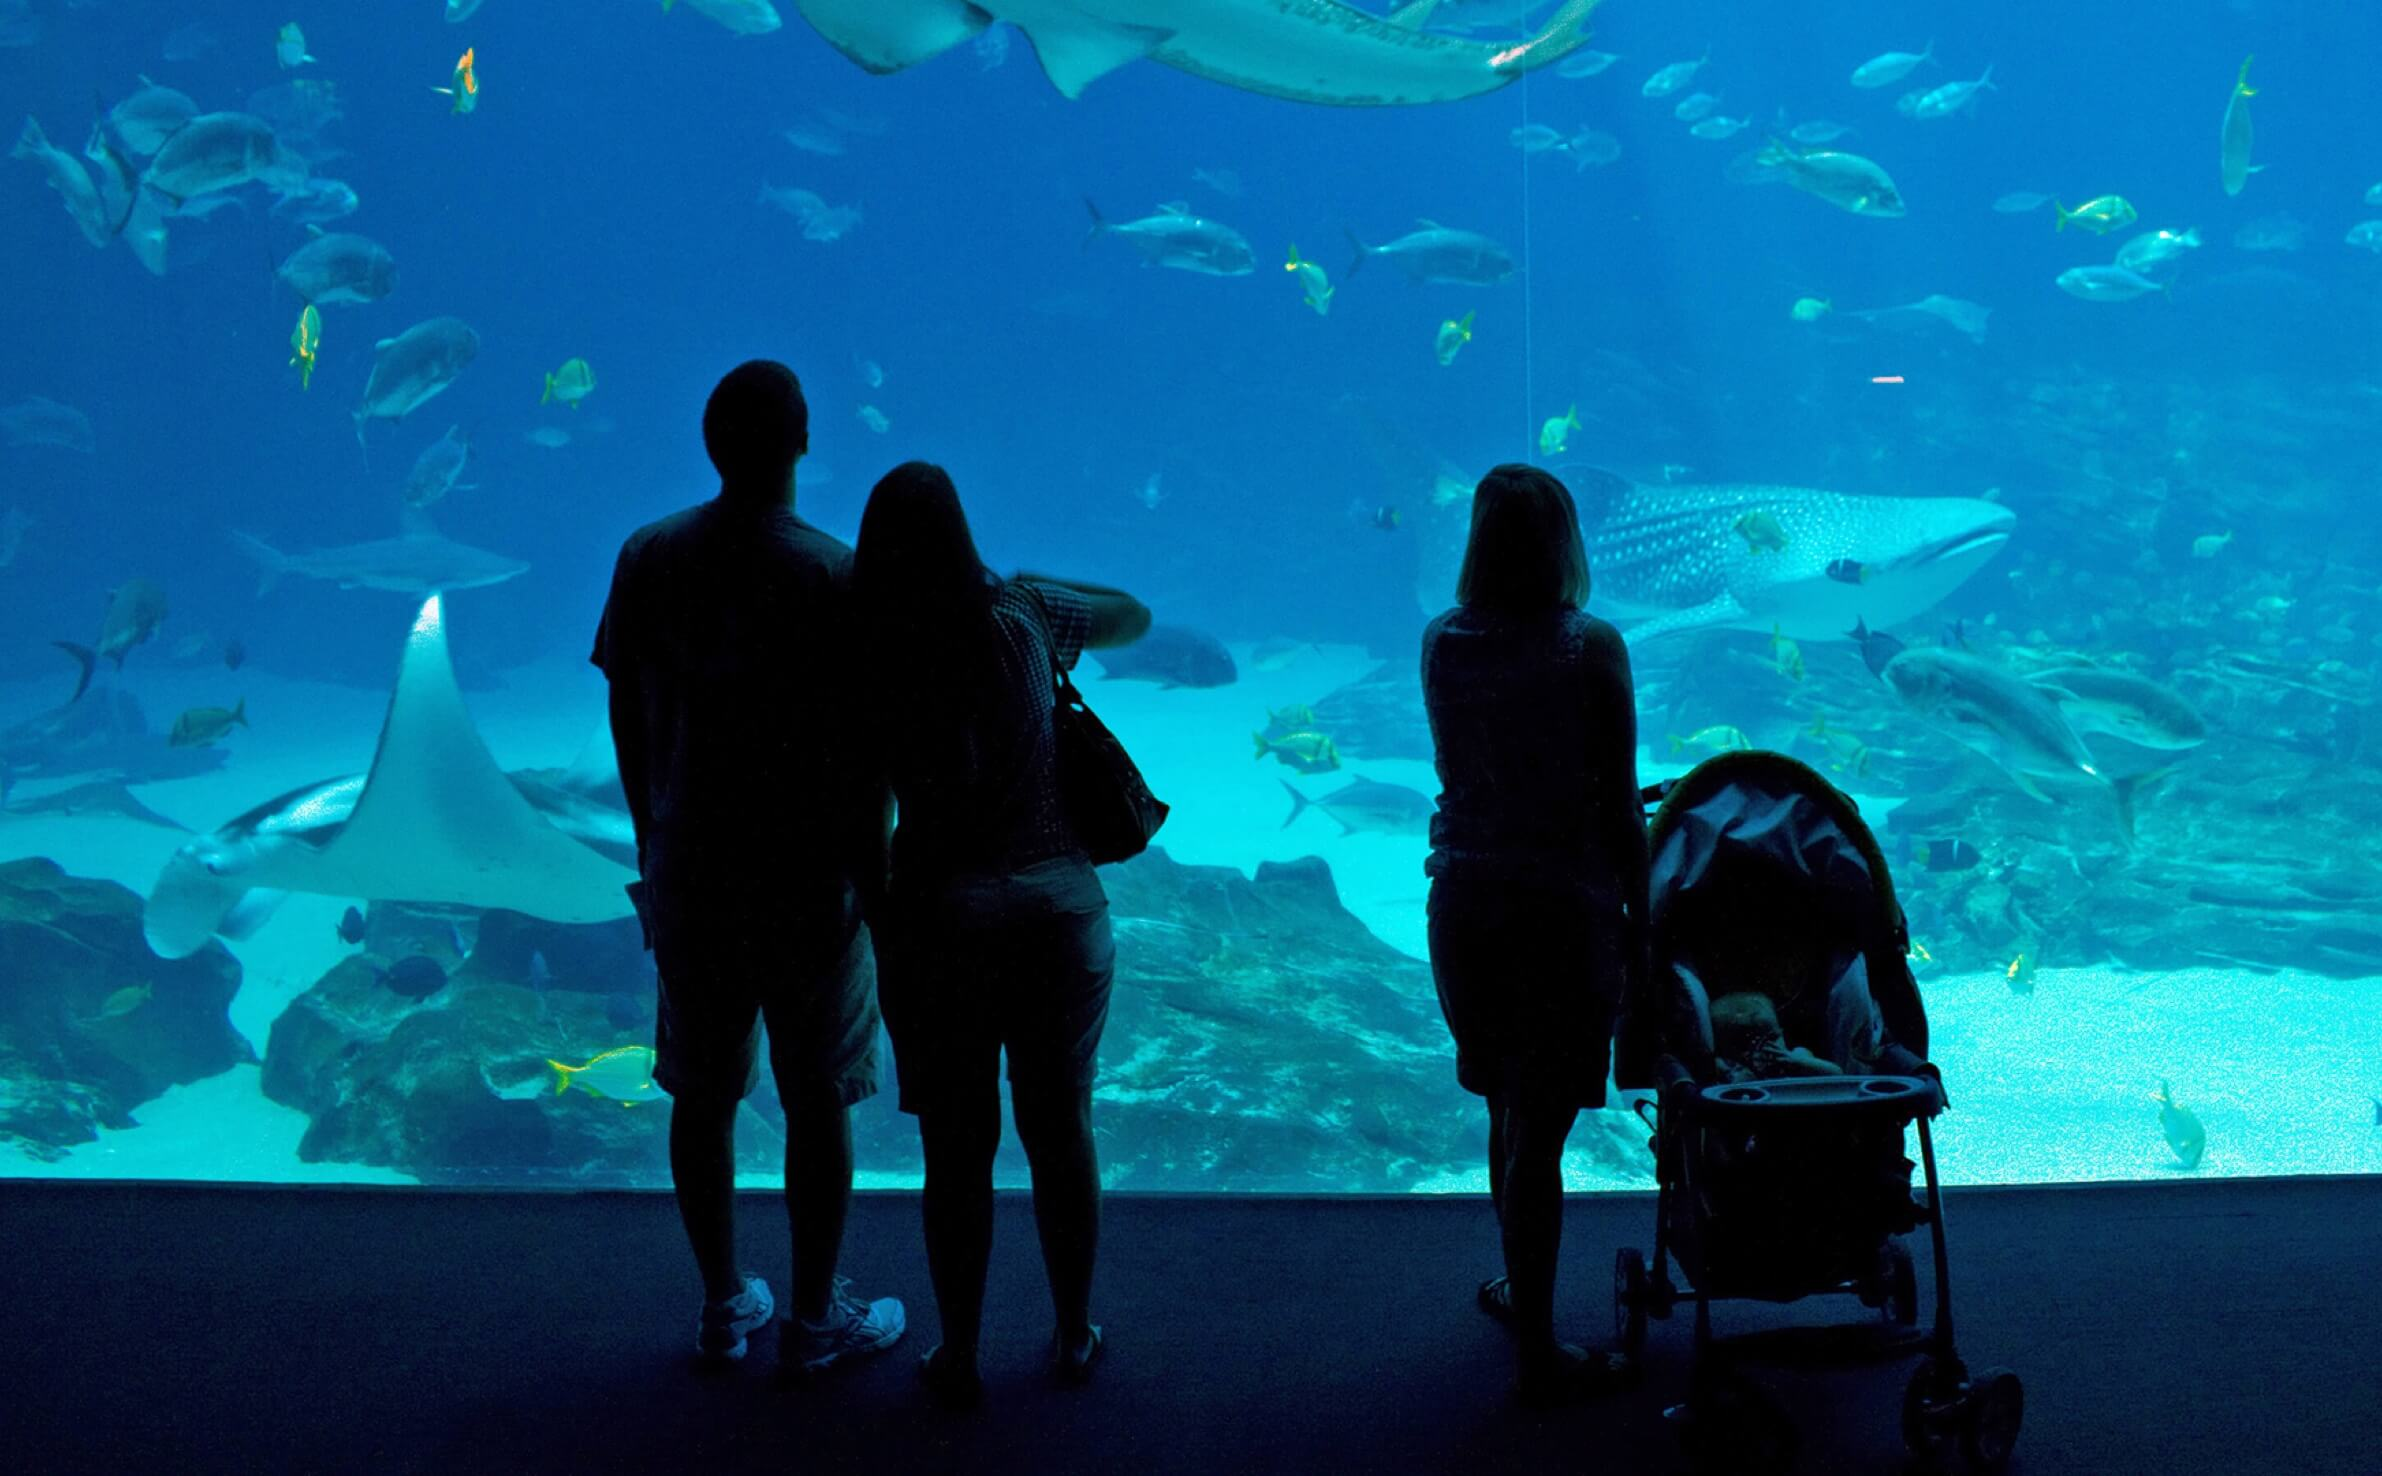 Visitors stand in front of fish tank at Georgia Aquarium